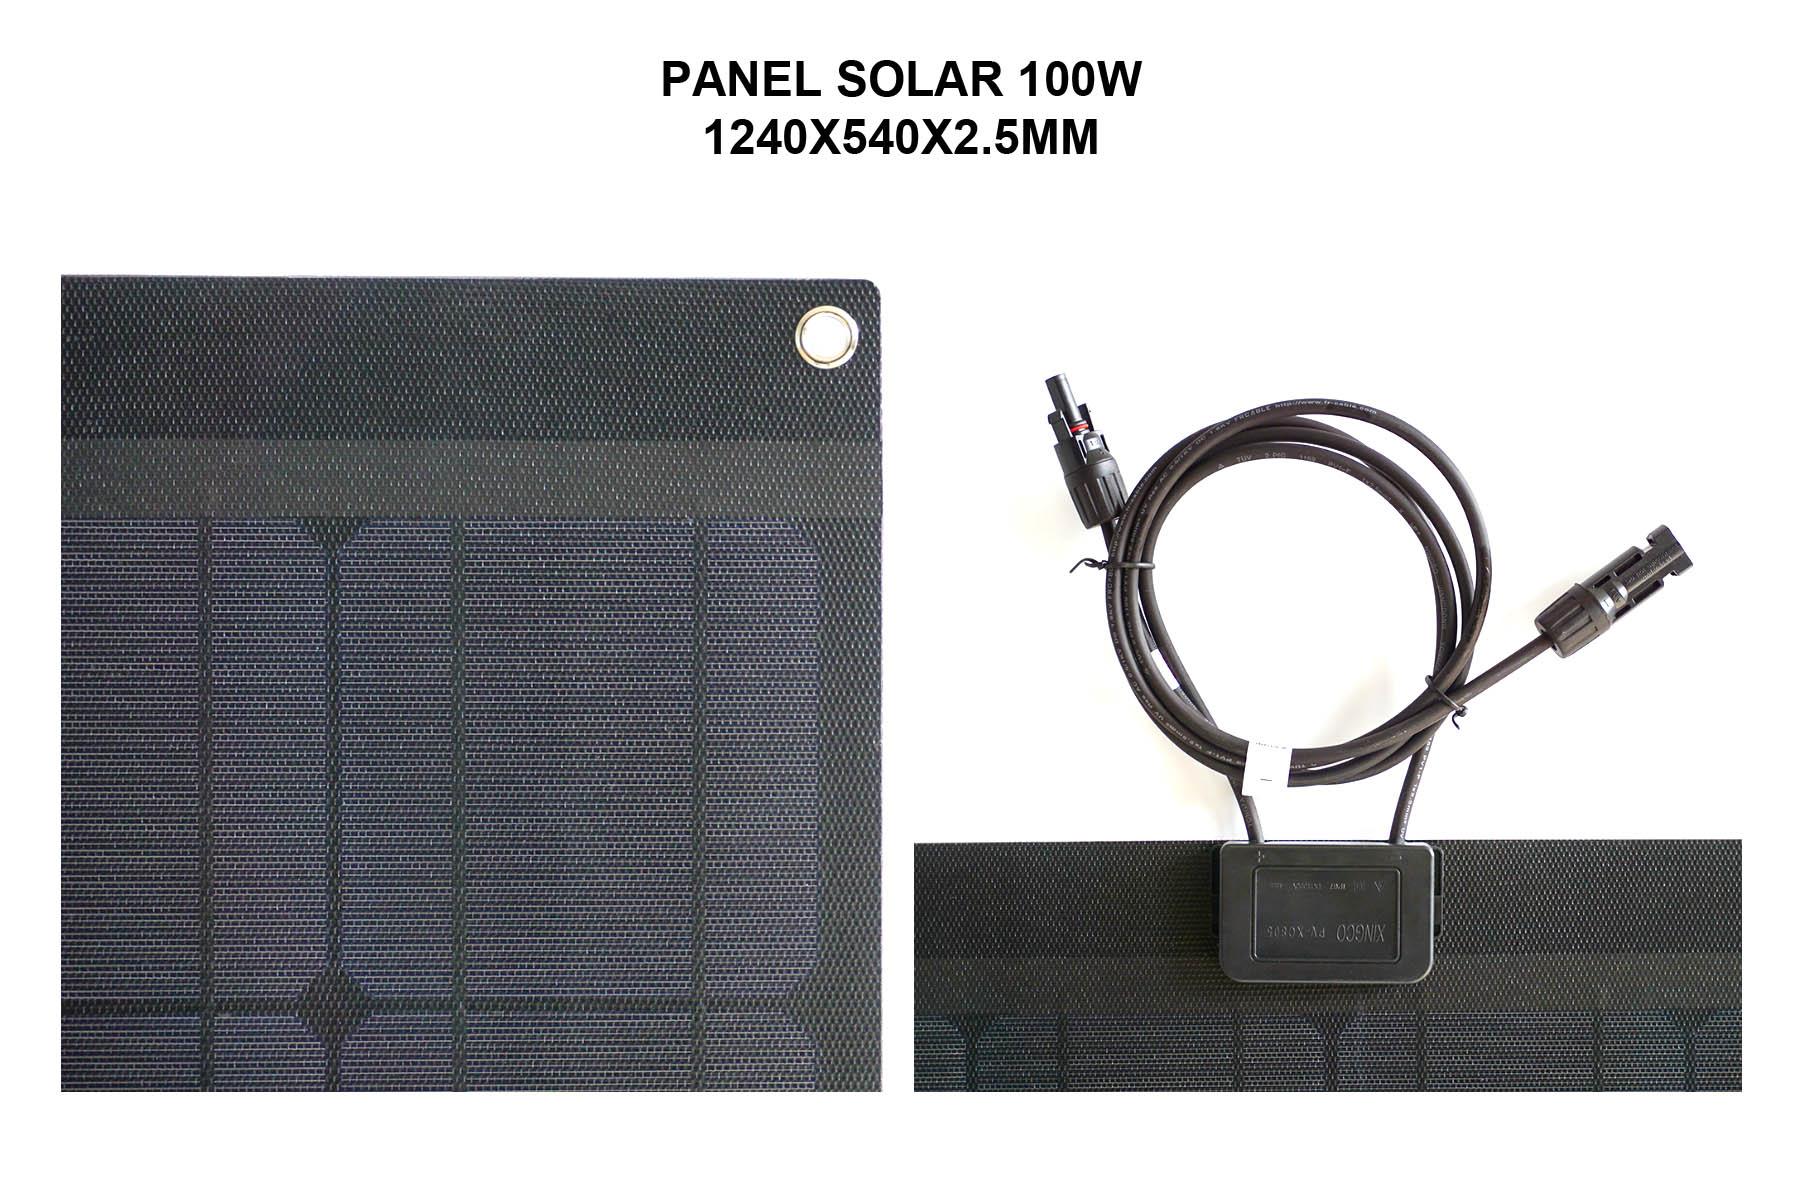 PANEL SOLAR 100W 1240X550X2.5MM